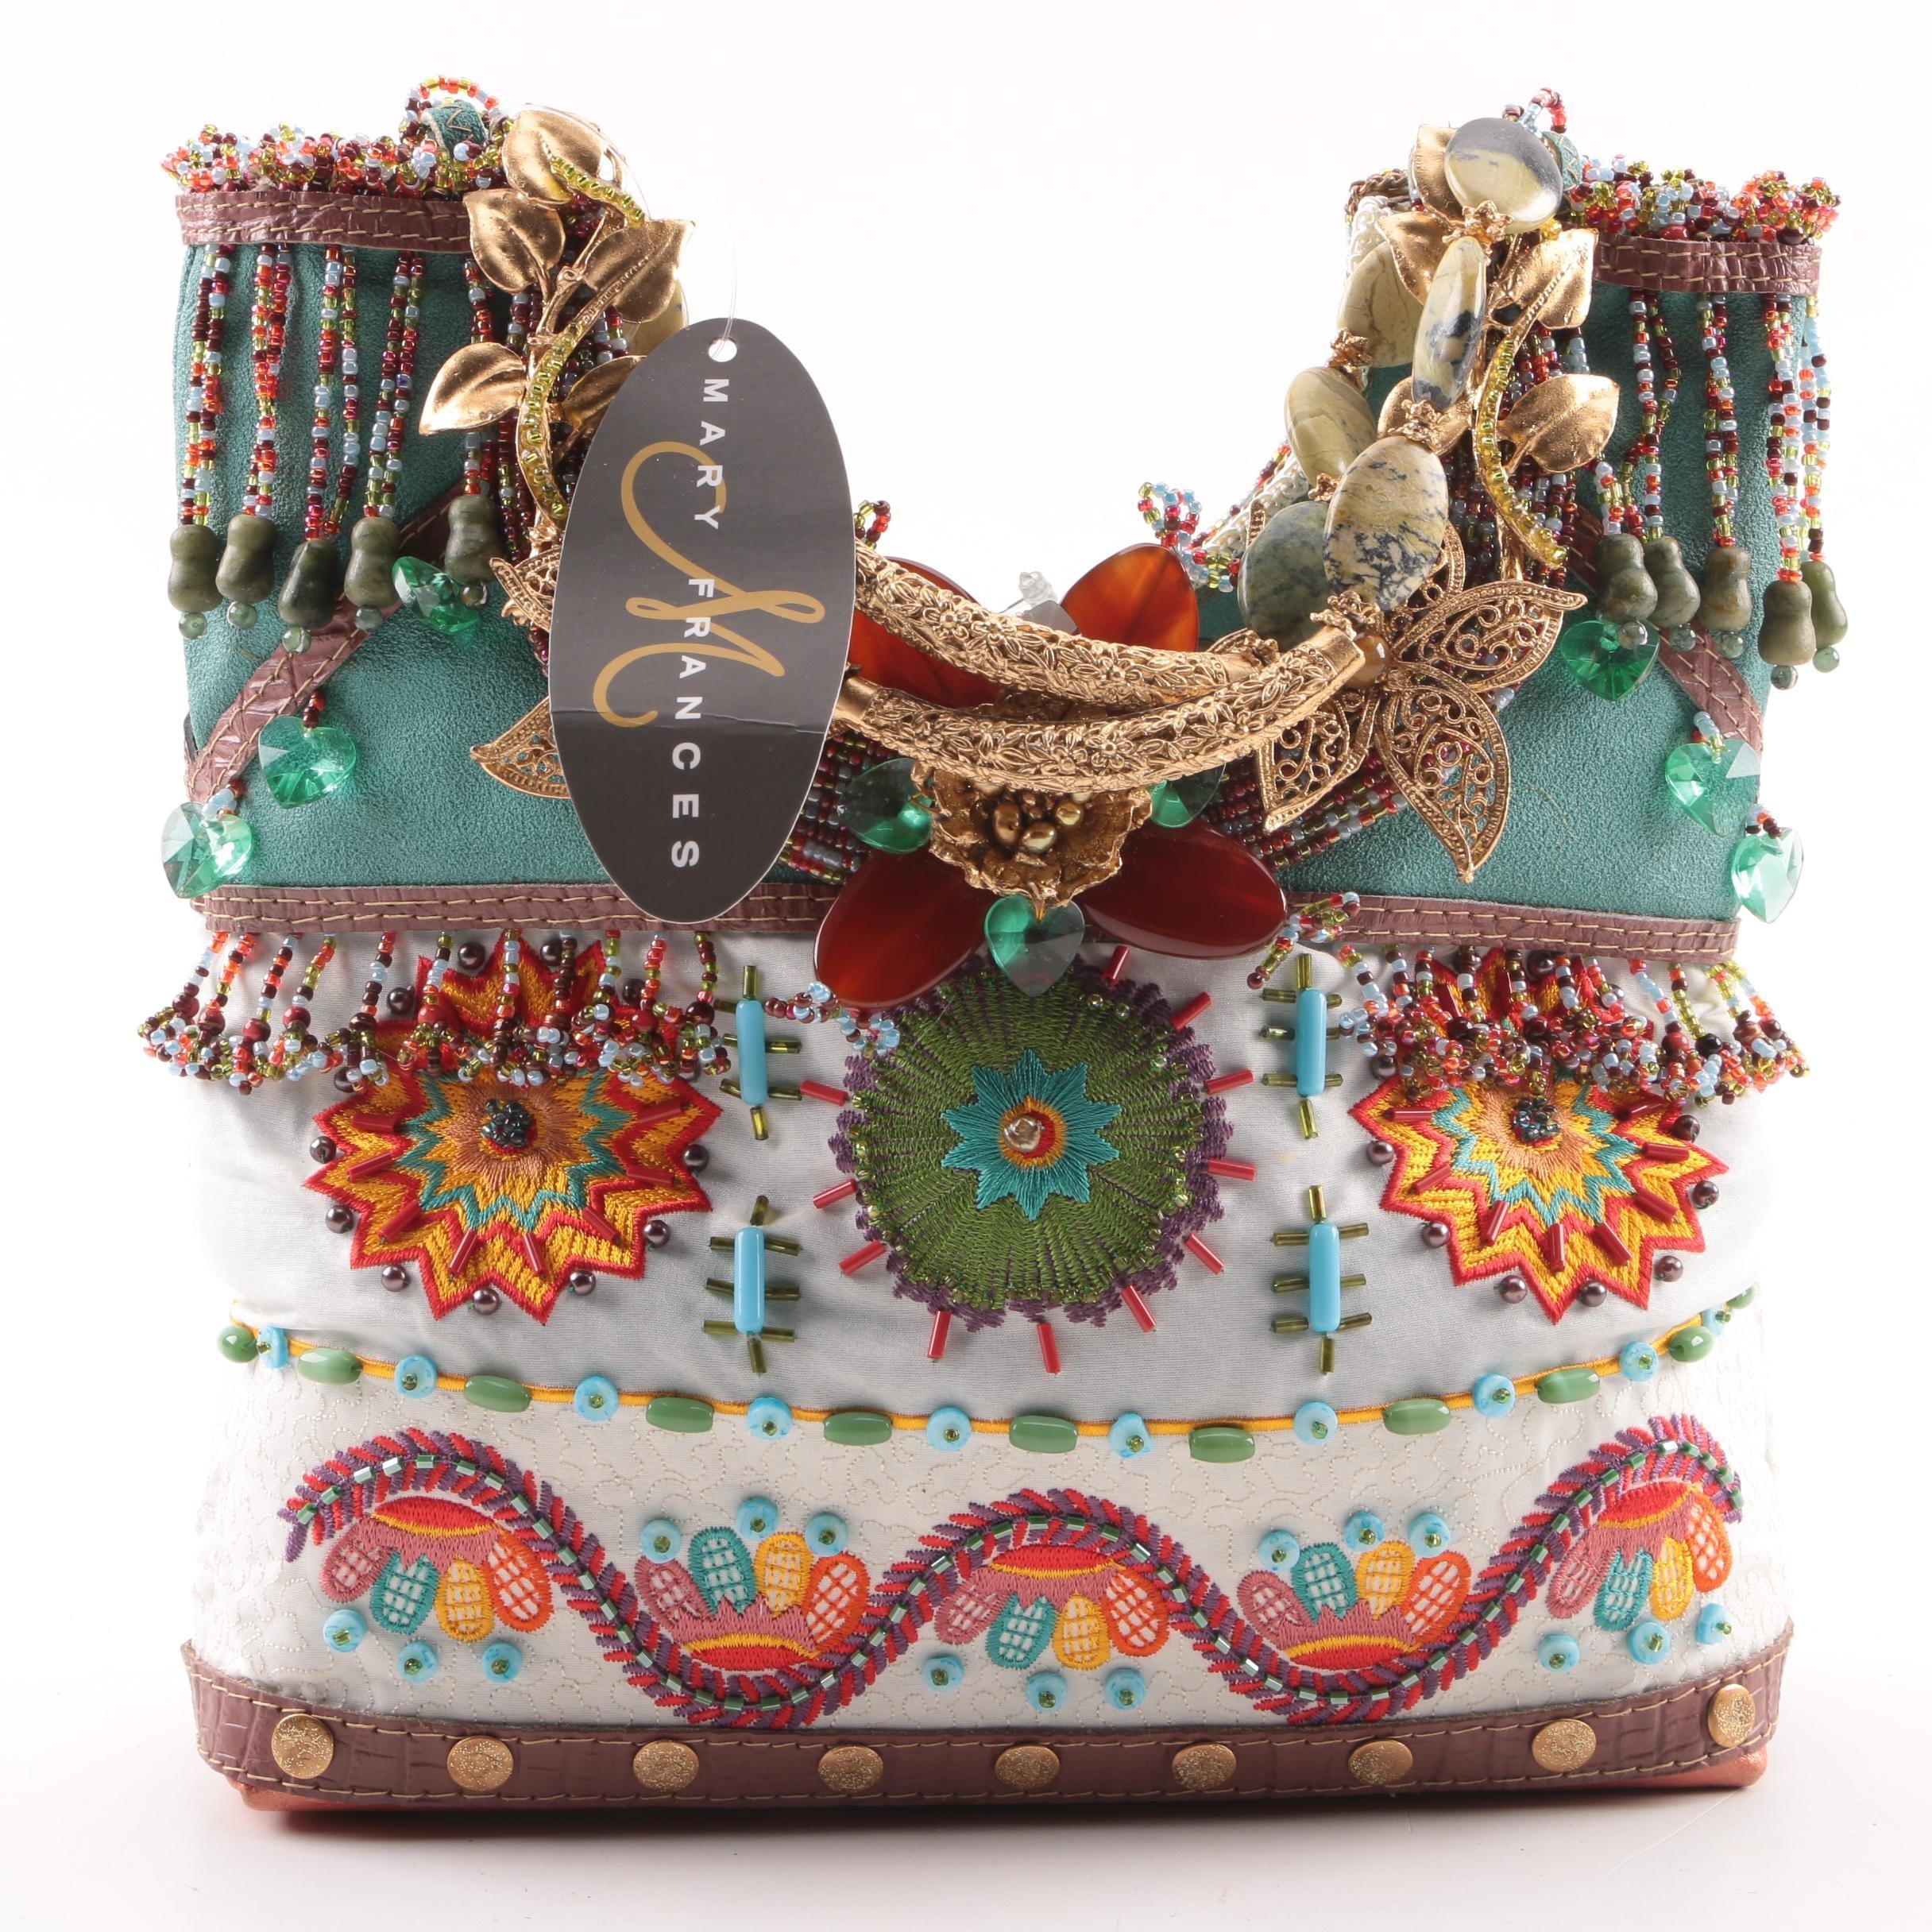 Mary Frances of San Francisco Beaded Handbag with Floral Filigree Accents